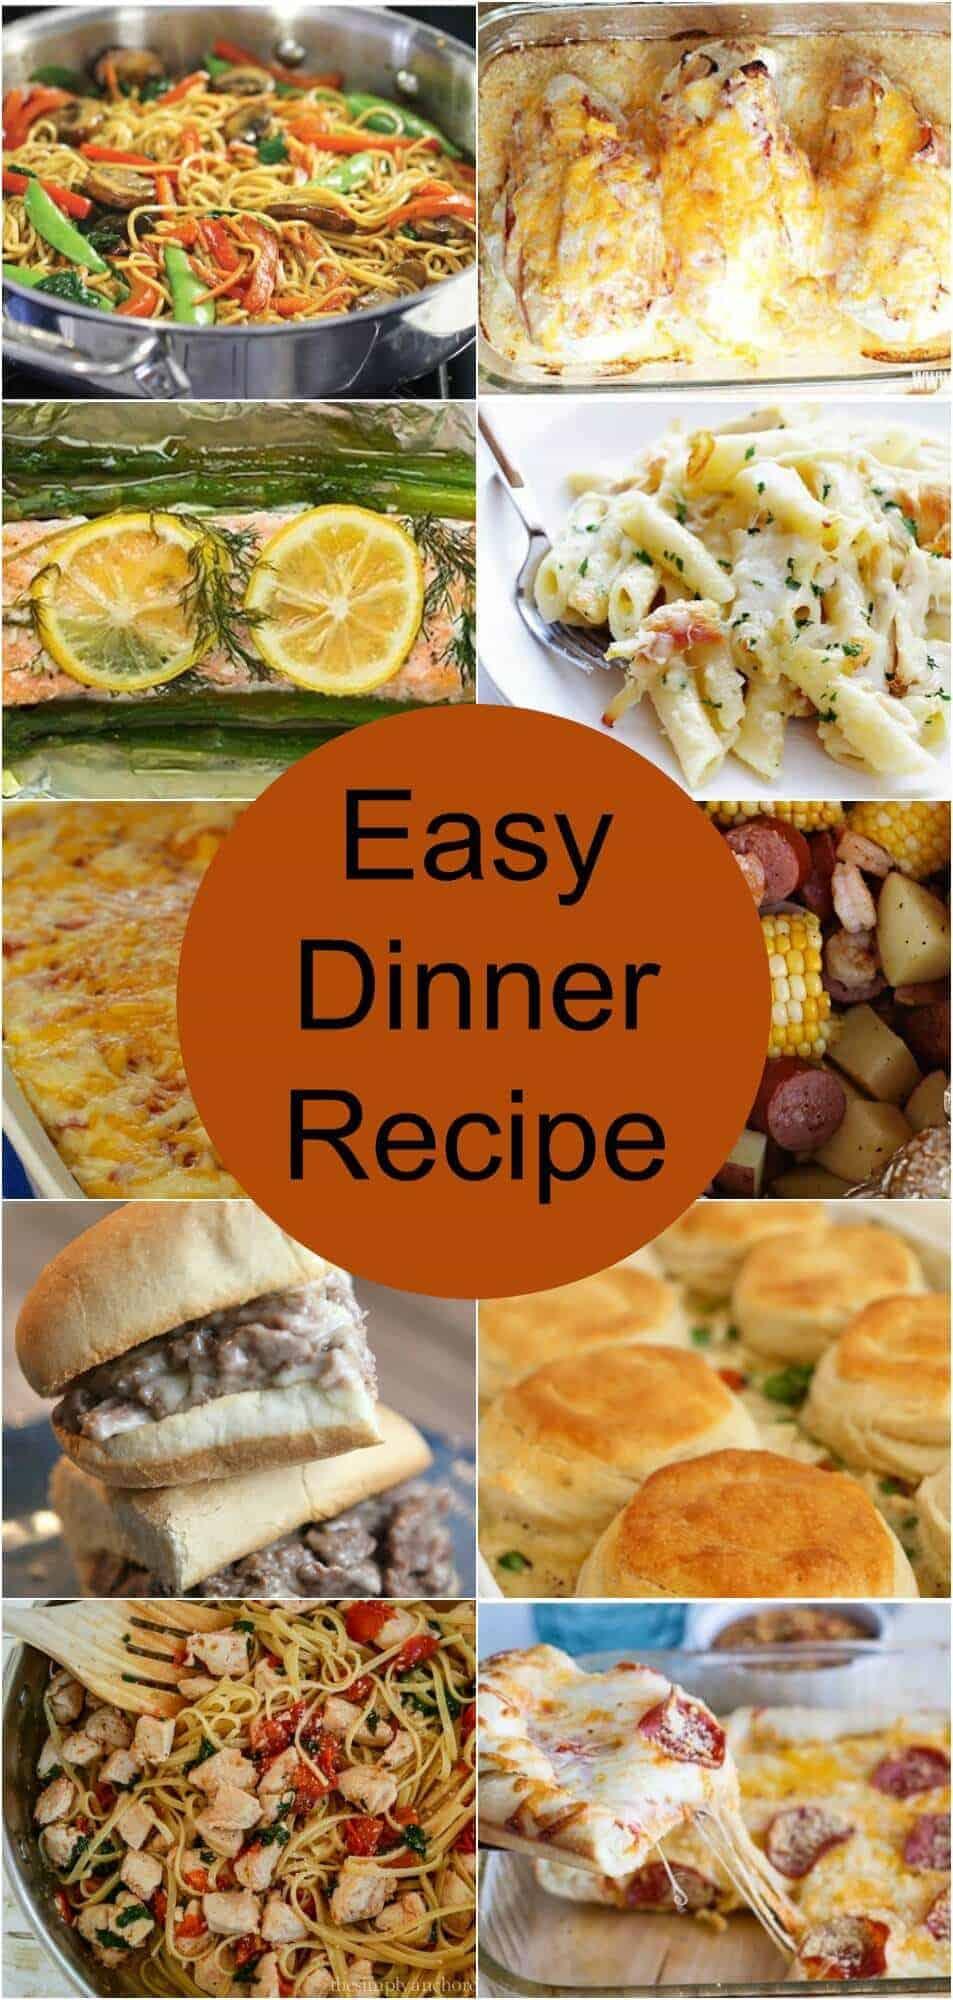 10 Easy Dinner Recipes - Princess Pinky Girl